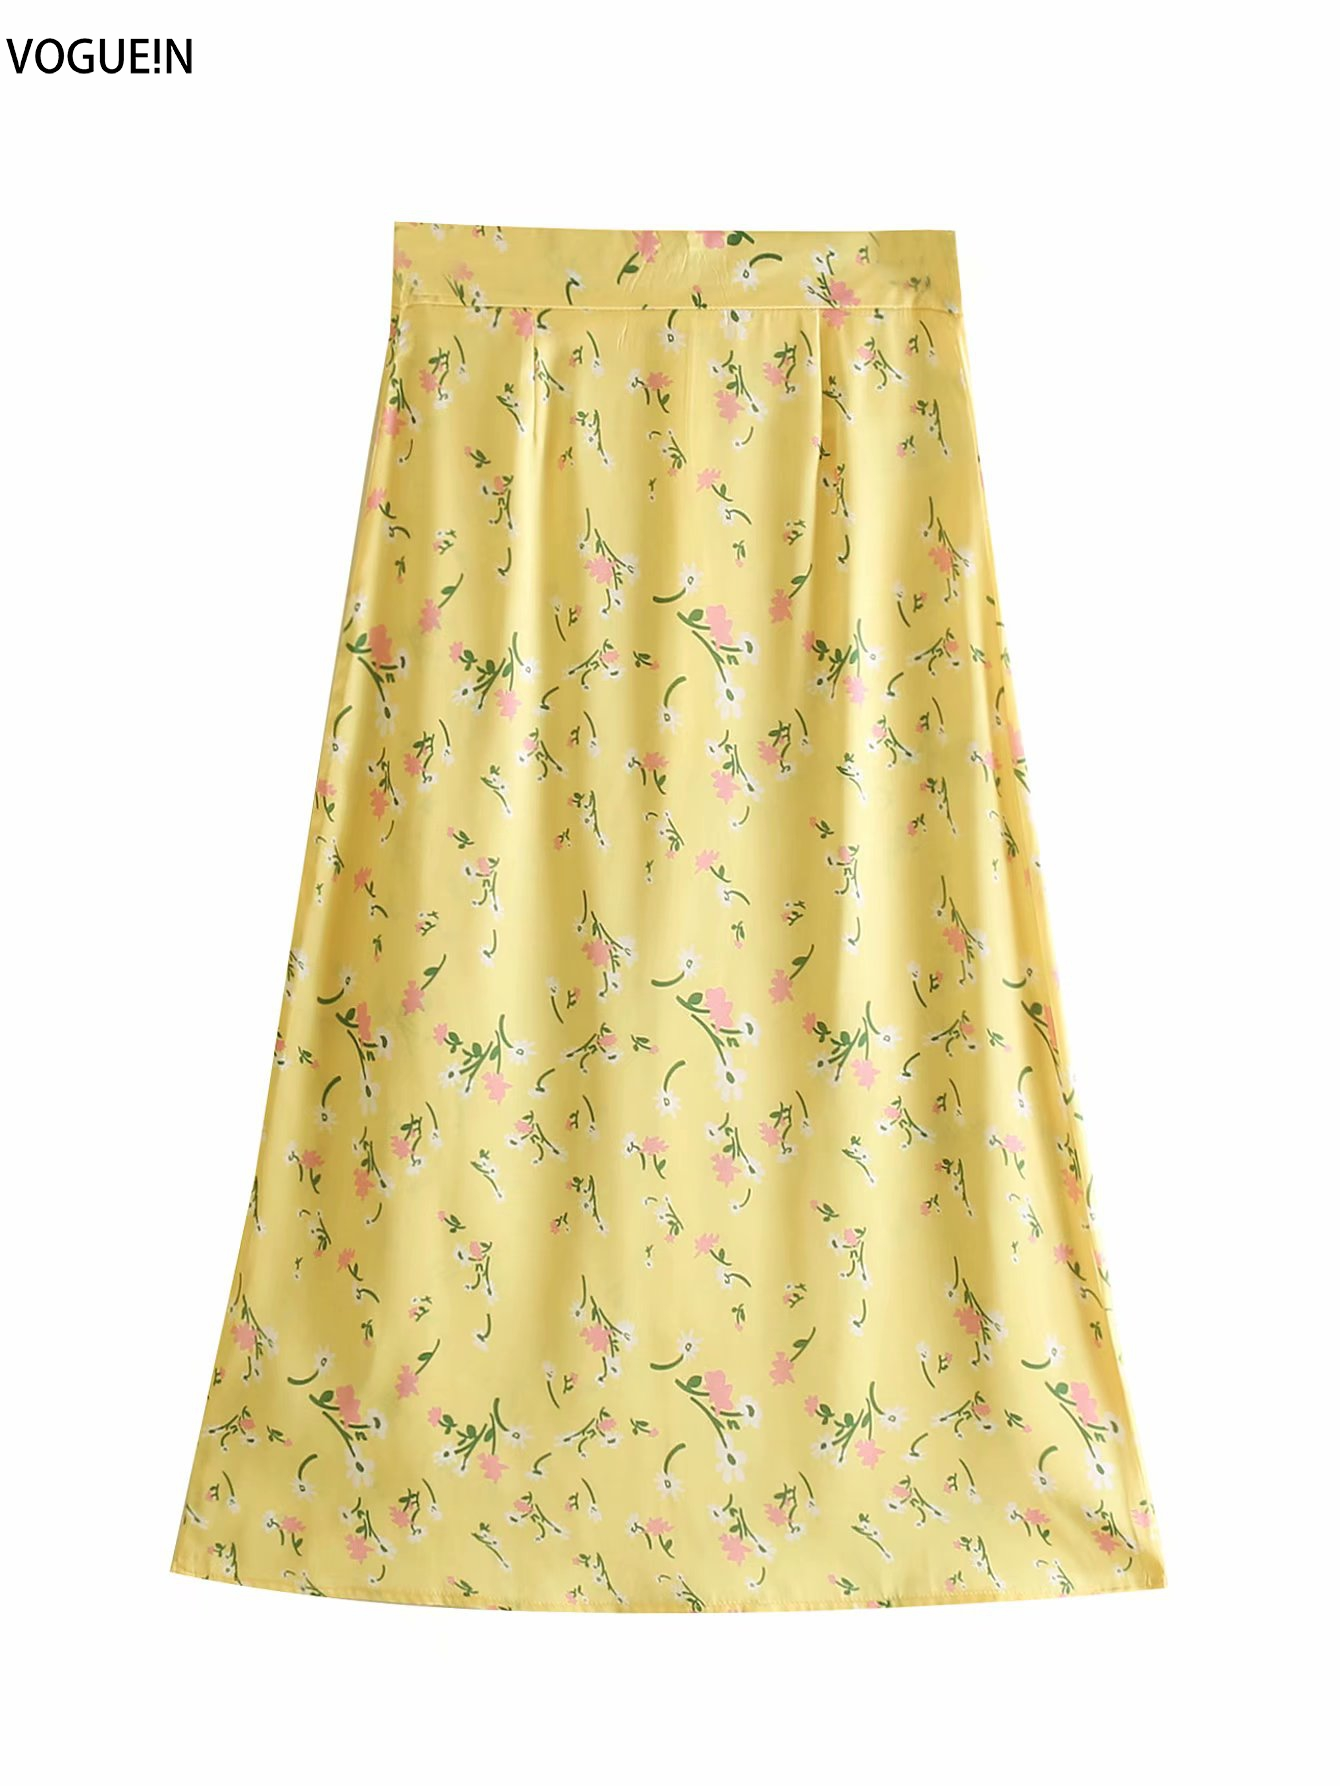 VOGUEIN New Womens Summer Casual Floral Print Yellow High Waist Zipper Midi Skirt Wholesale